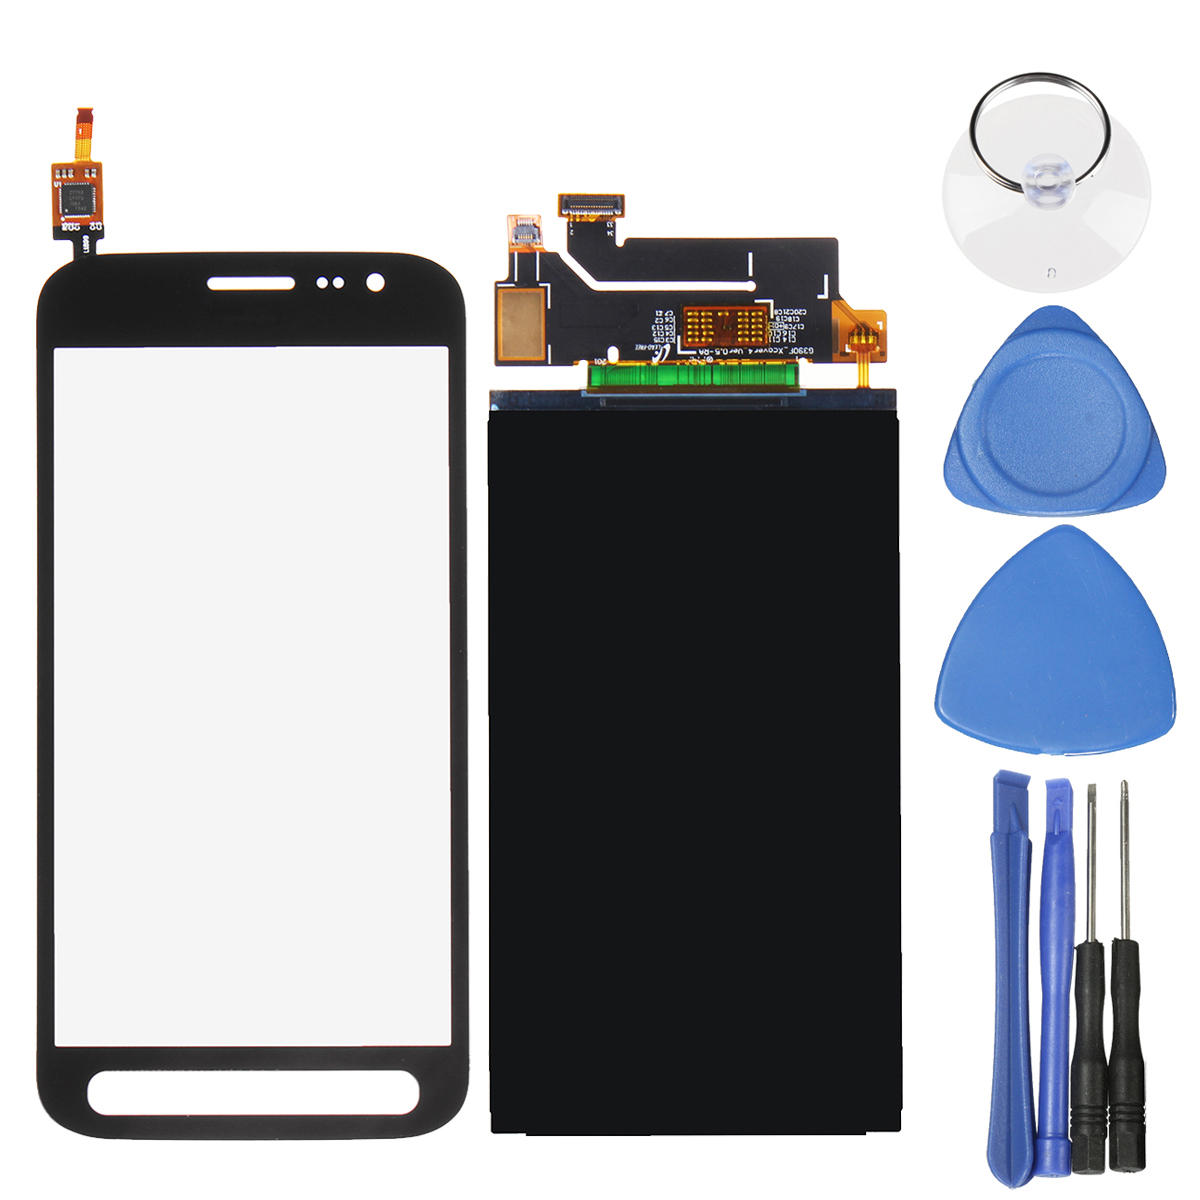 LCD Дисплей Сенсорный экран с цифрователем и Набор для Samsung Galaxy Xcover 4 G390 SM-G390F